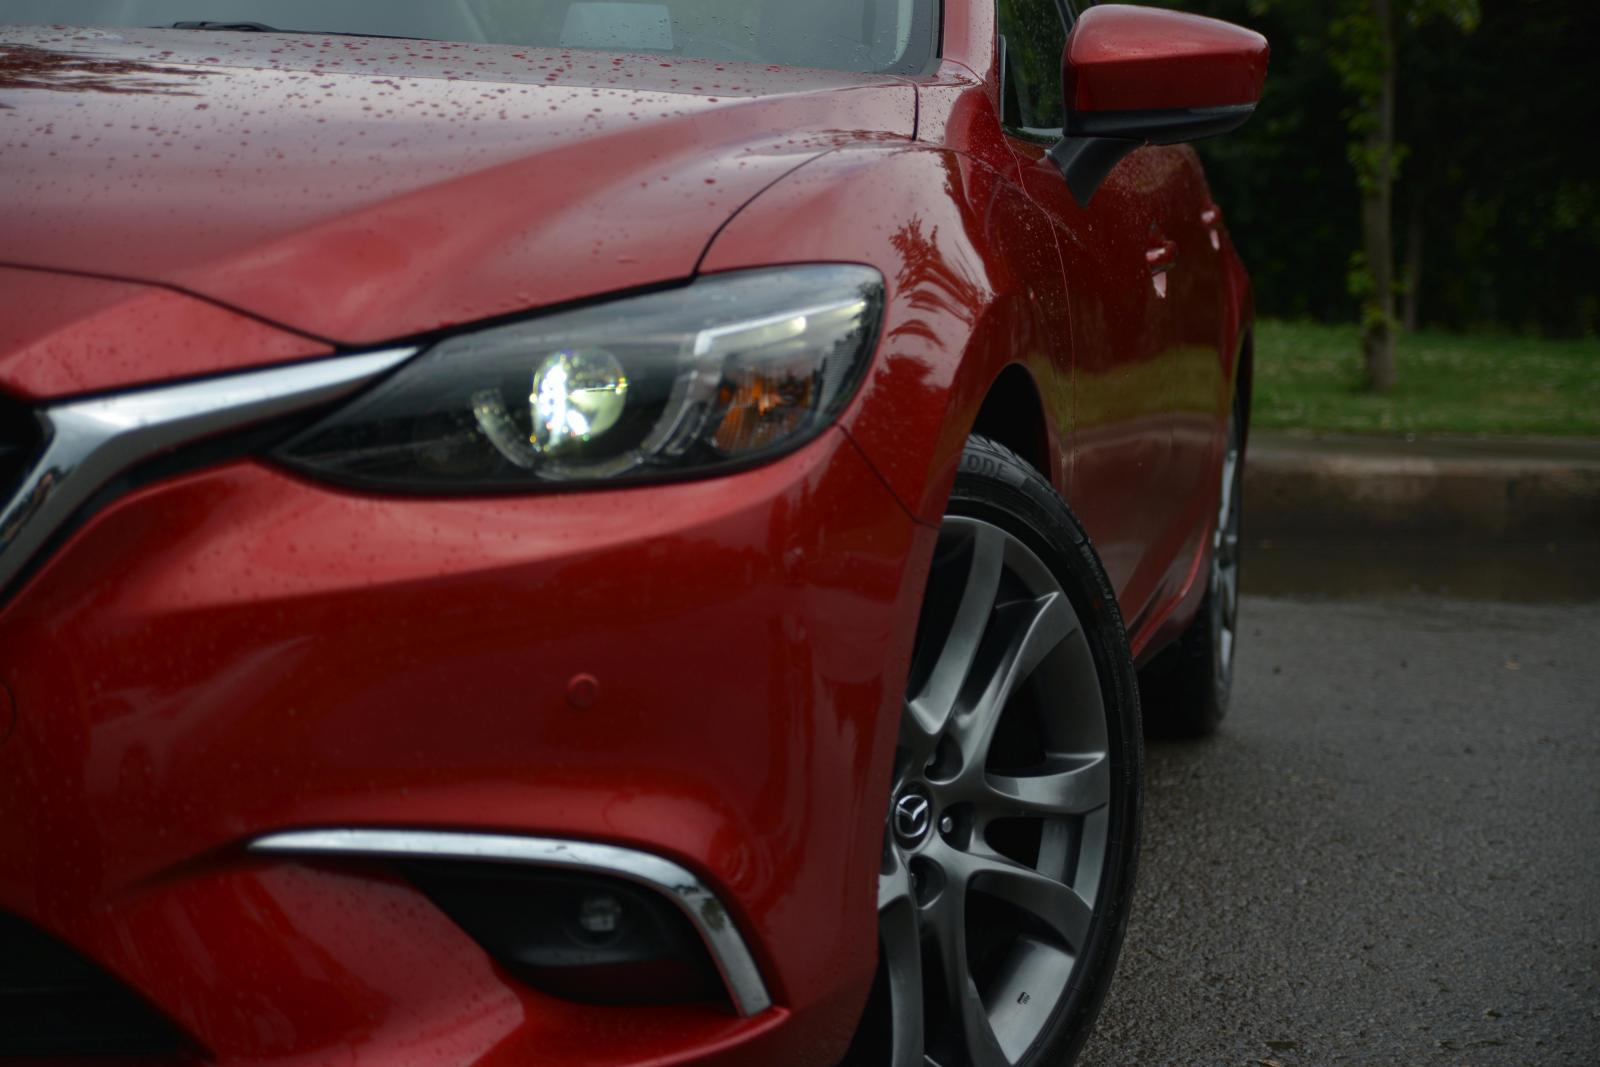 2017 Mazda6 Dış Görünüş Far